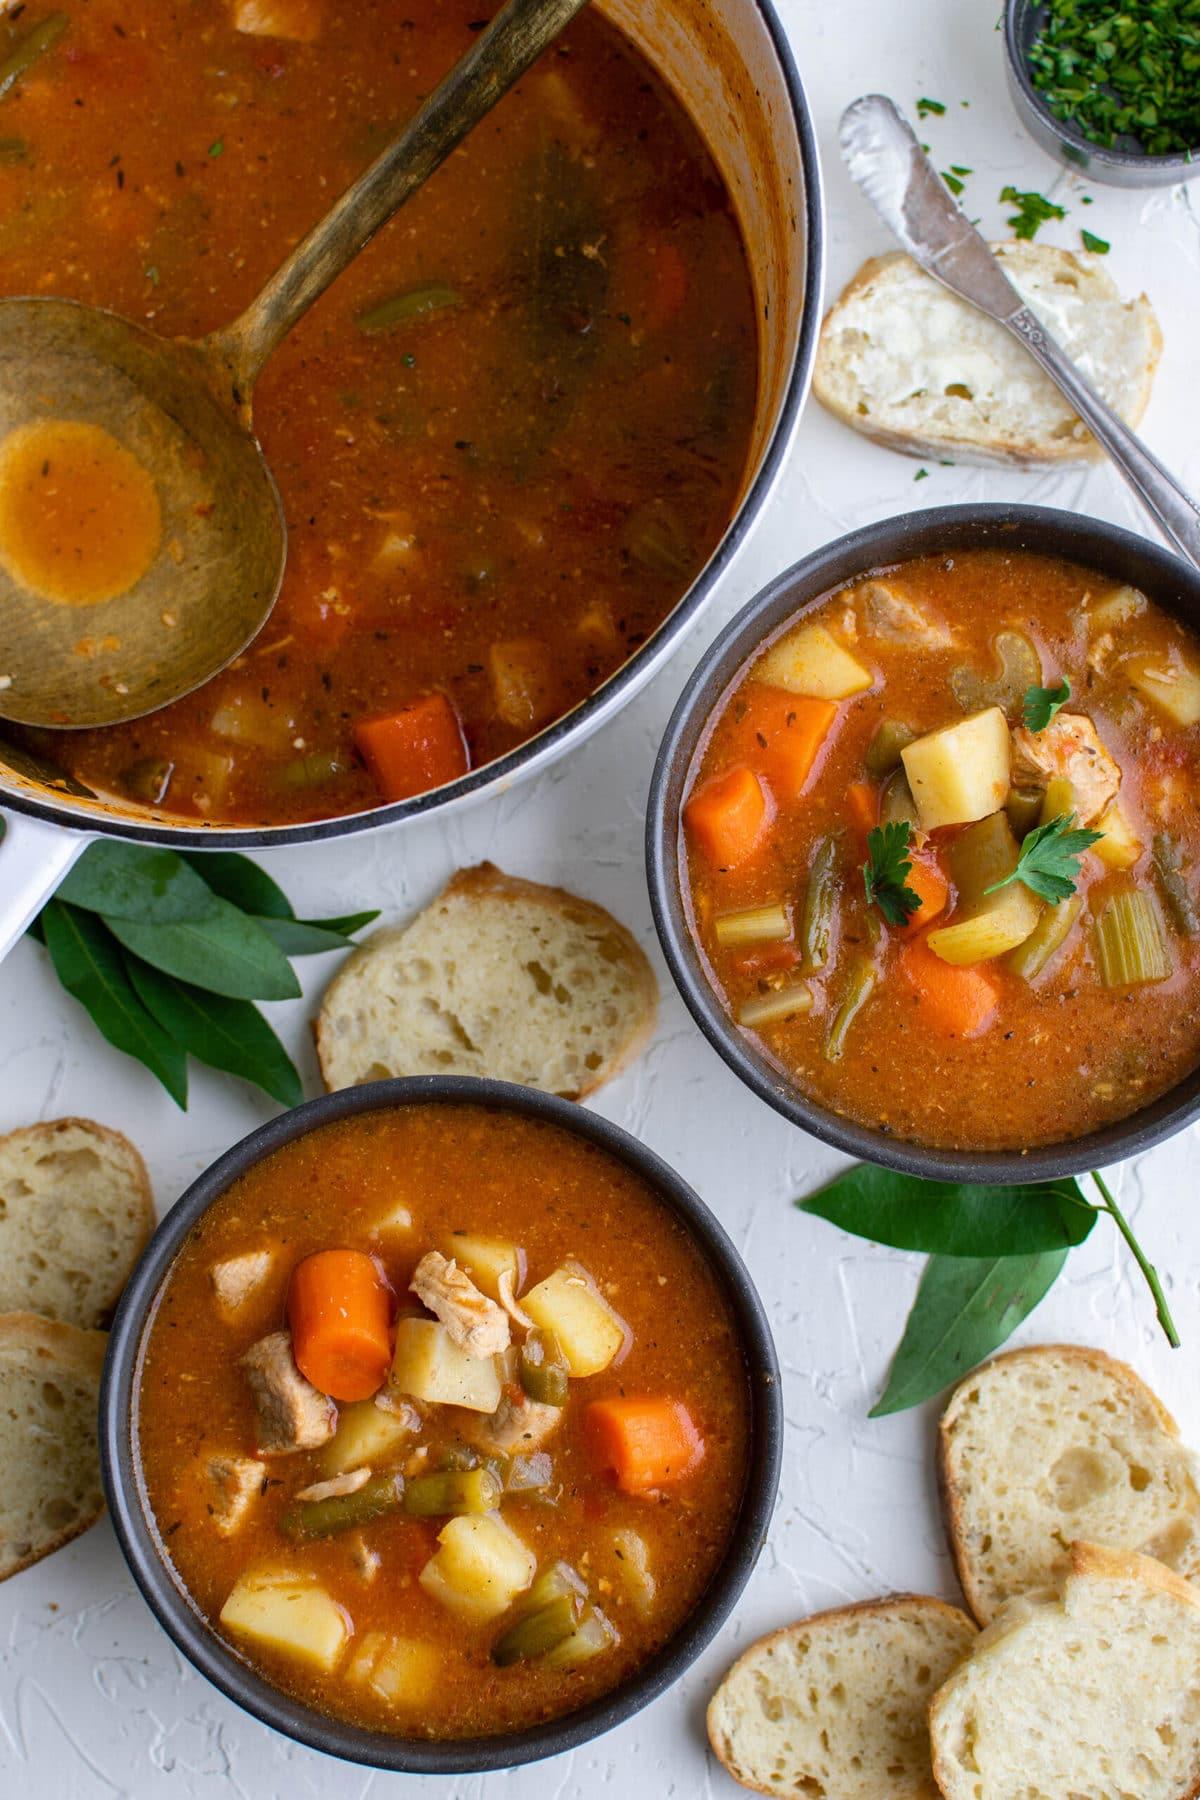 pork stewm blue bowls, white soup pot, slices of bread .spoons